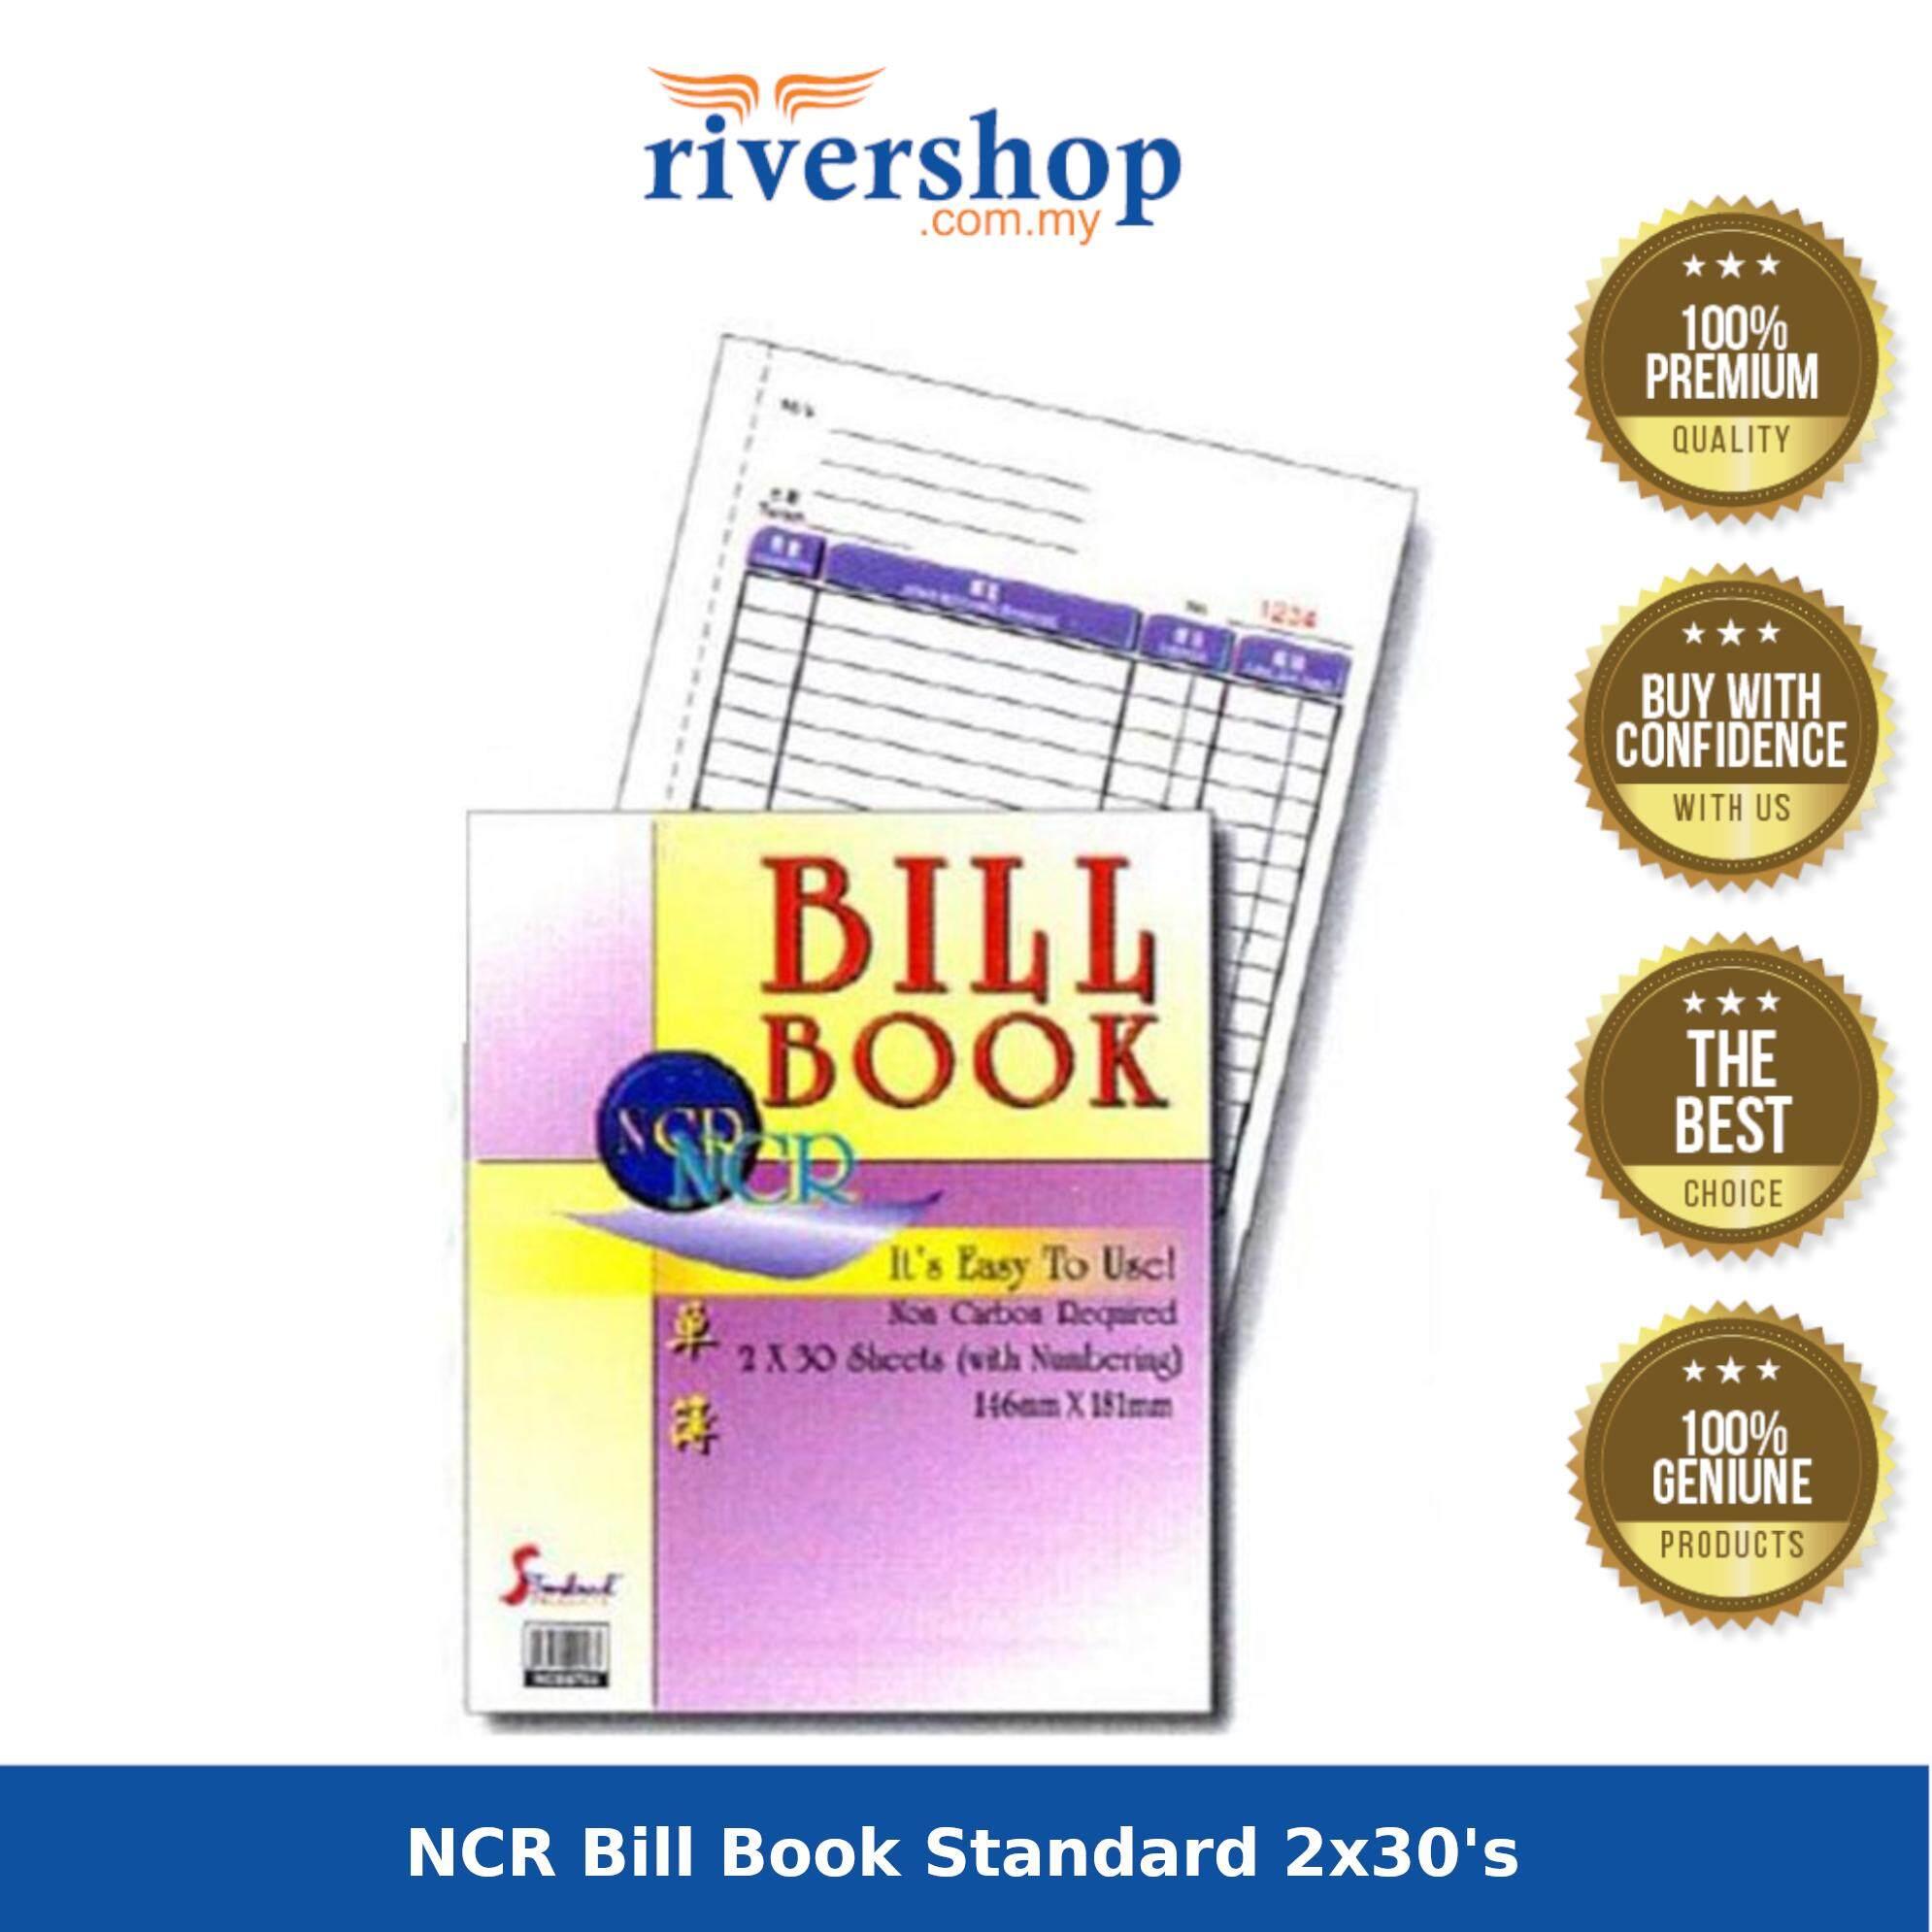 NCR Bill Book Standard 2x30\'s (NCB-6702) - 15 x 17.5 x 0.5 cm